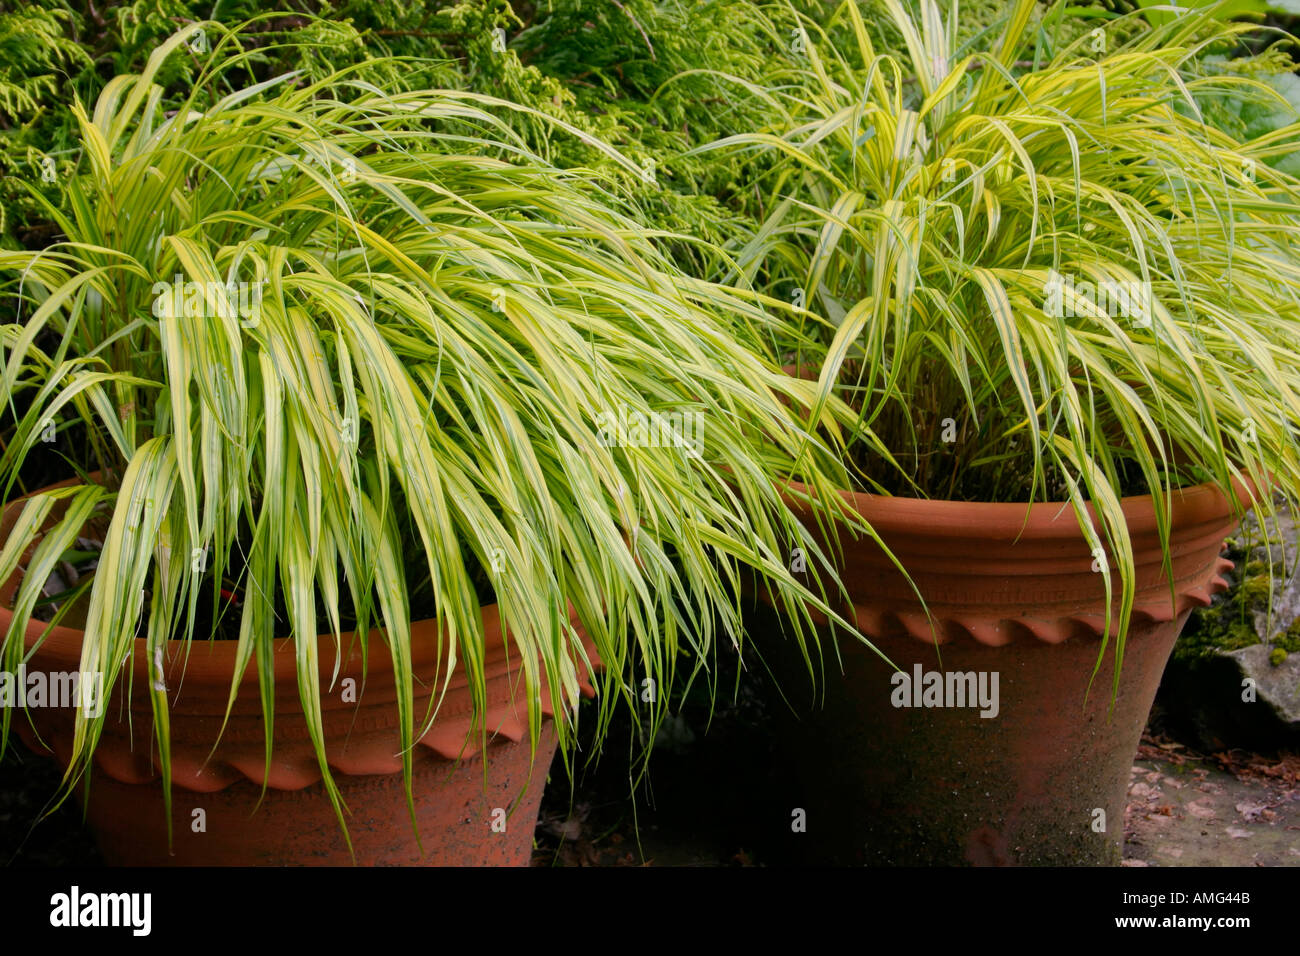 Ornamental golden hakone grass from japan in pots for Ornamental japanese grass